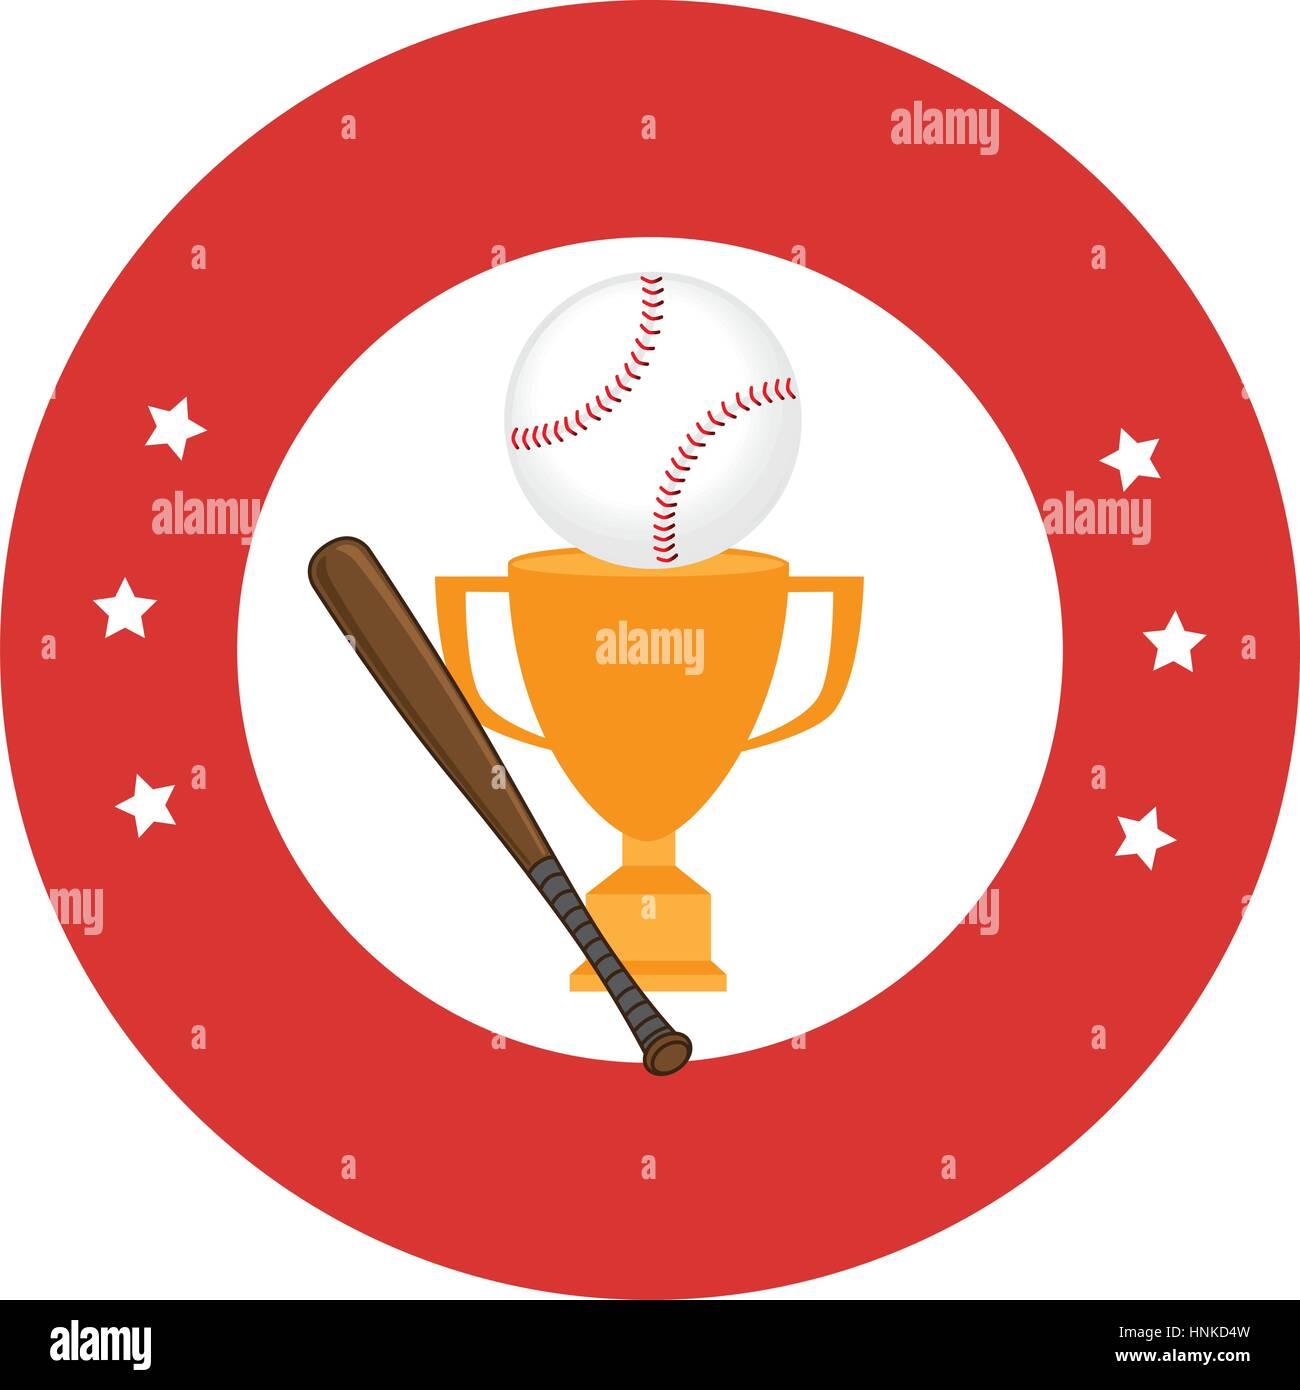 Baseball Trophy Stockfotos & Baseball Trophy Bilder - Seite 3 - Alamy